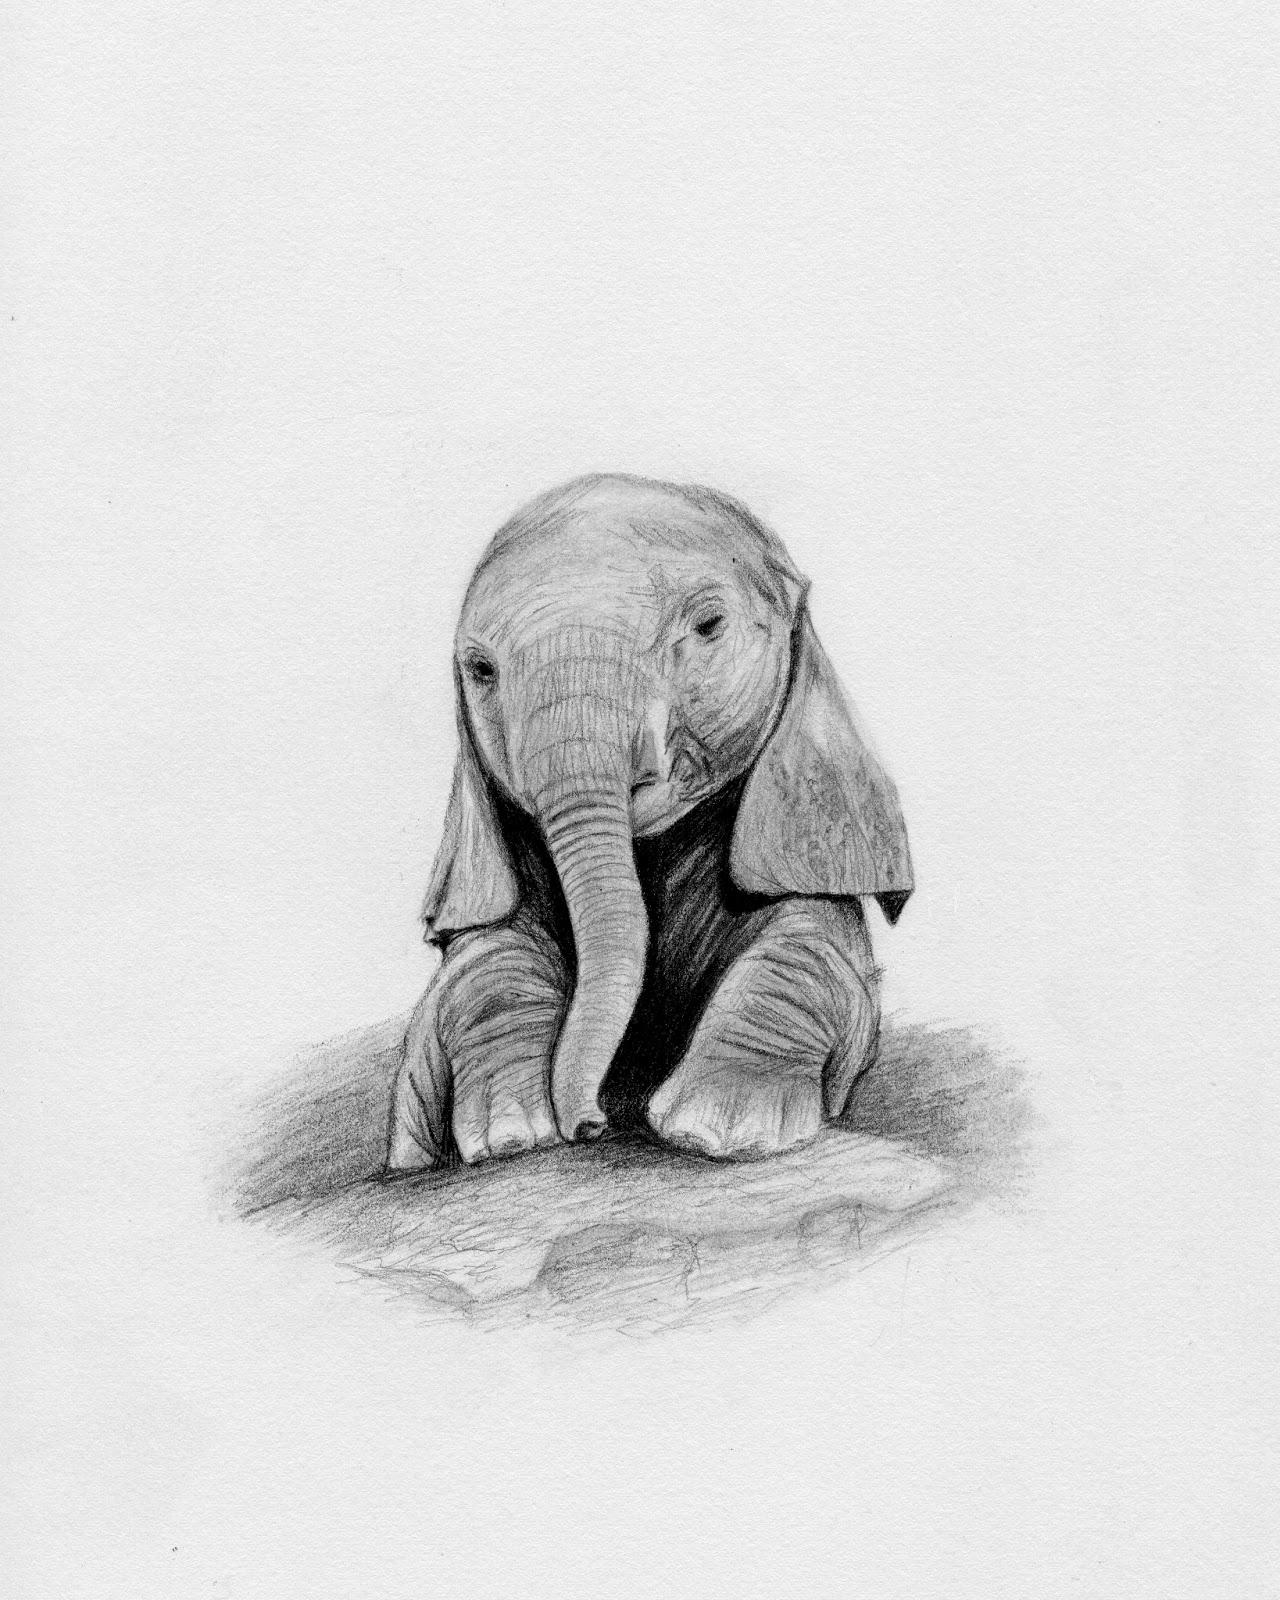 Pencil Drawings Of Elephants Tumblr Elephant Drawings In P...